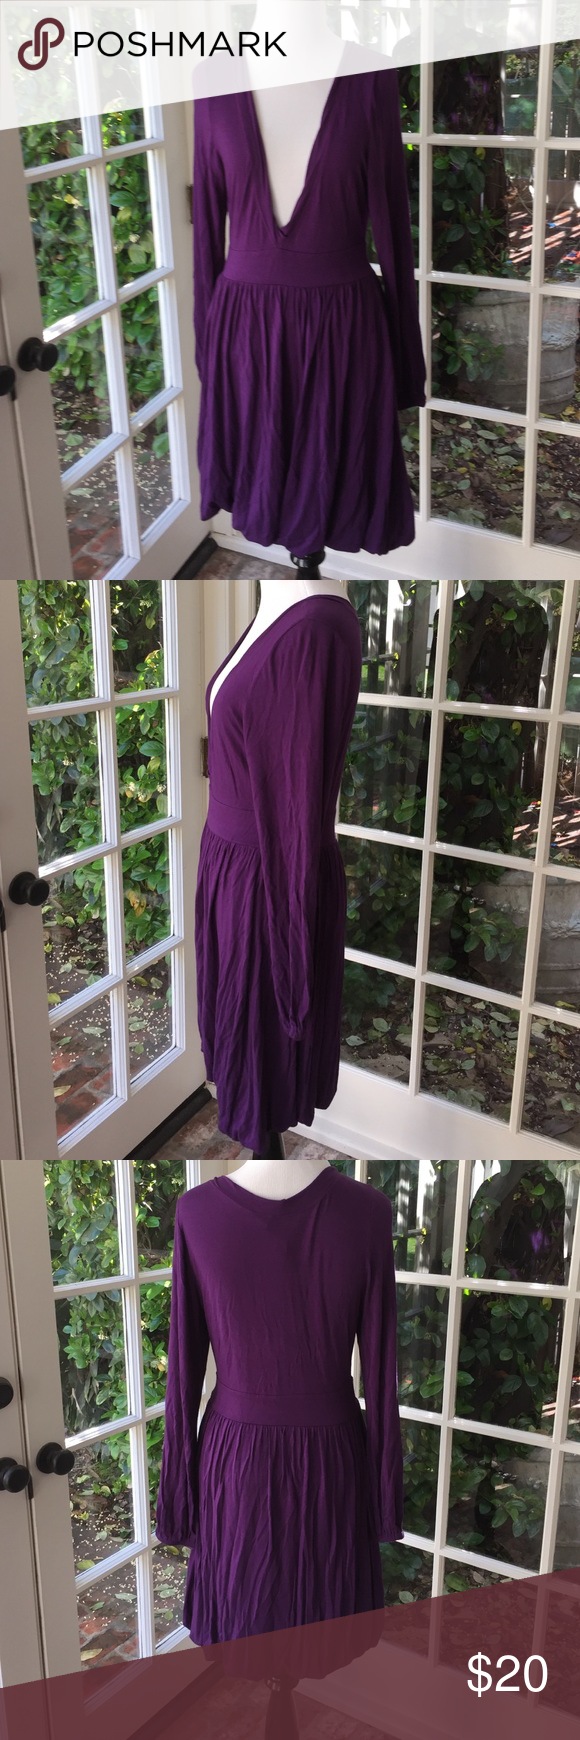 Wilster Purple V Neck Dress Clothes Design Dresses Fashion [ 1740 x 580 Pixel ]